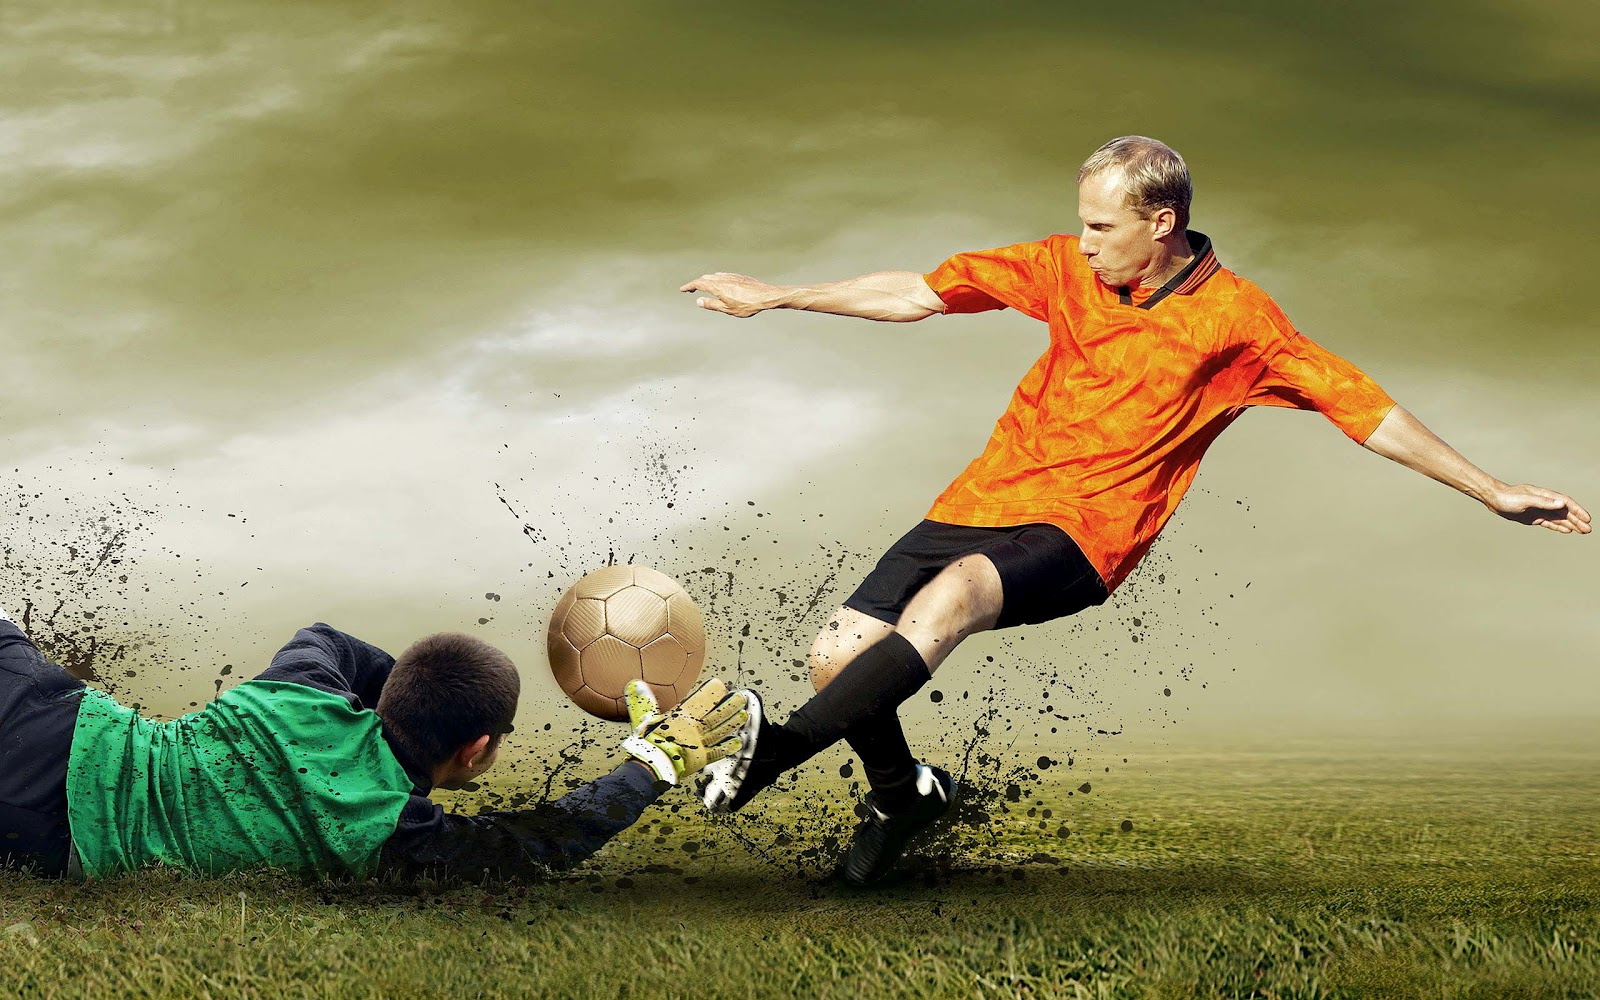 desktop wallpapers sports soccer backgrounds games15jpg 1600x1000